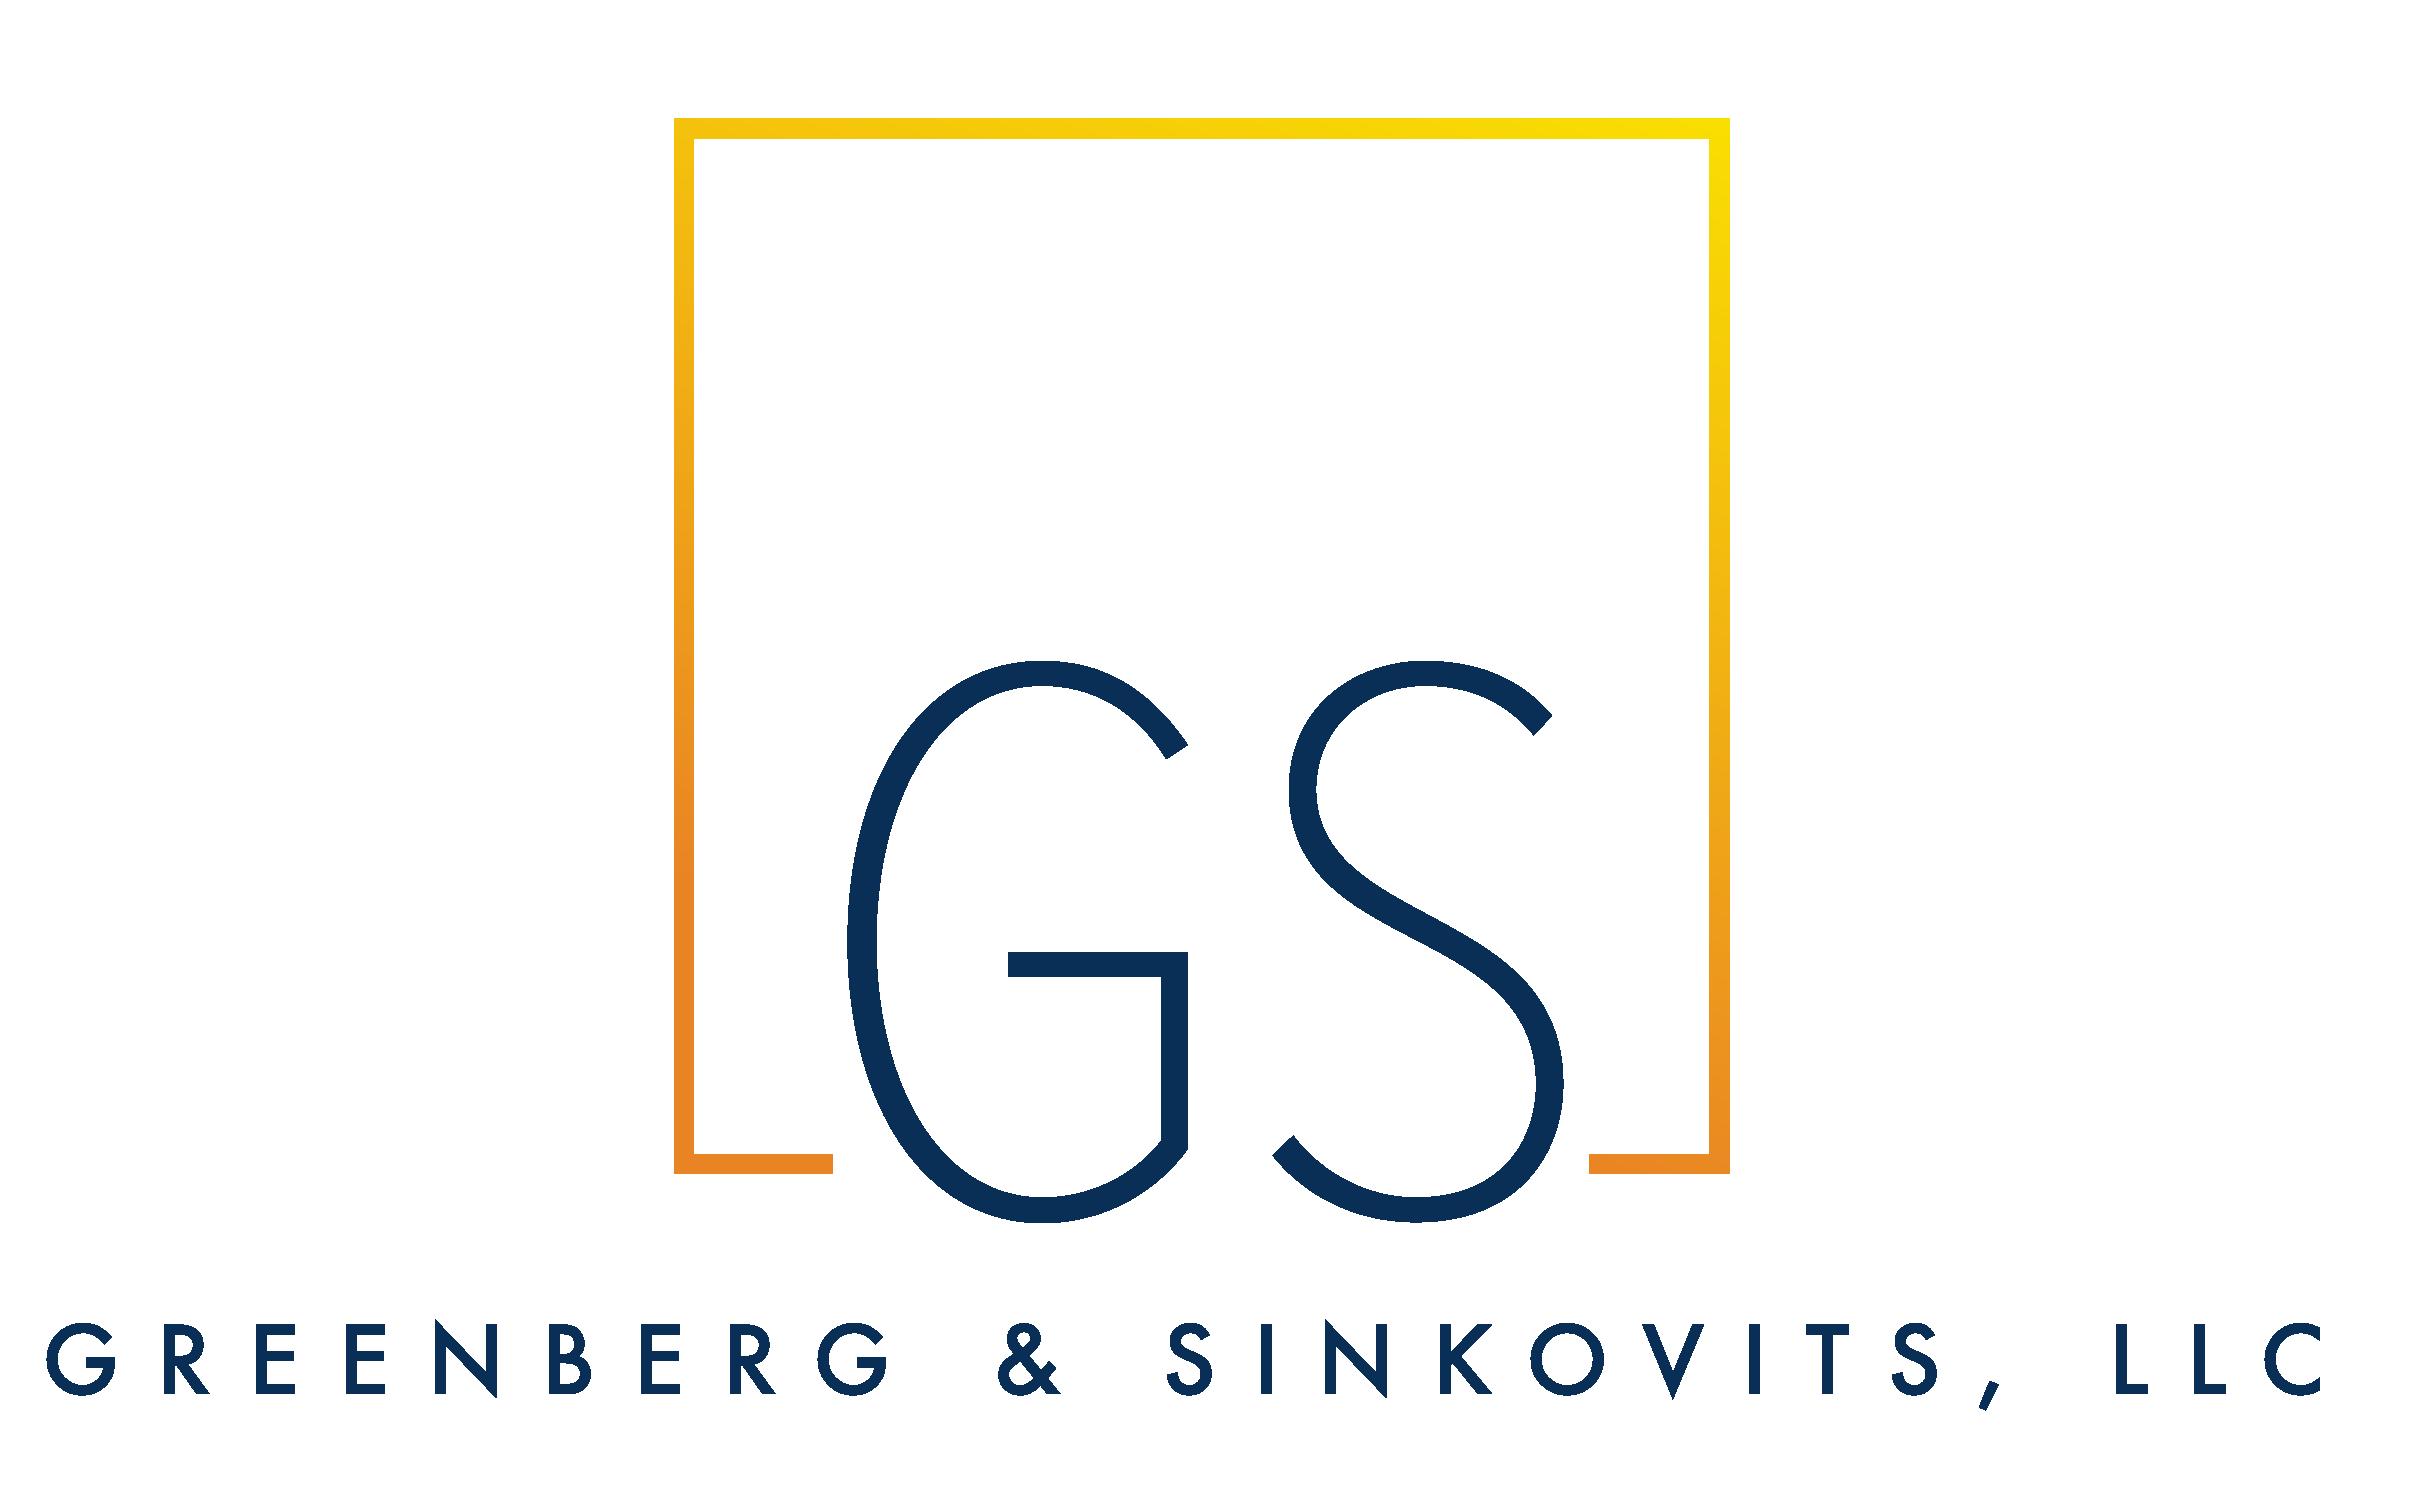 Greenberg & Sinkovits